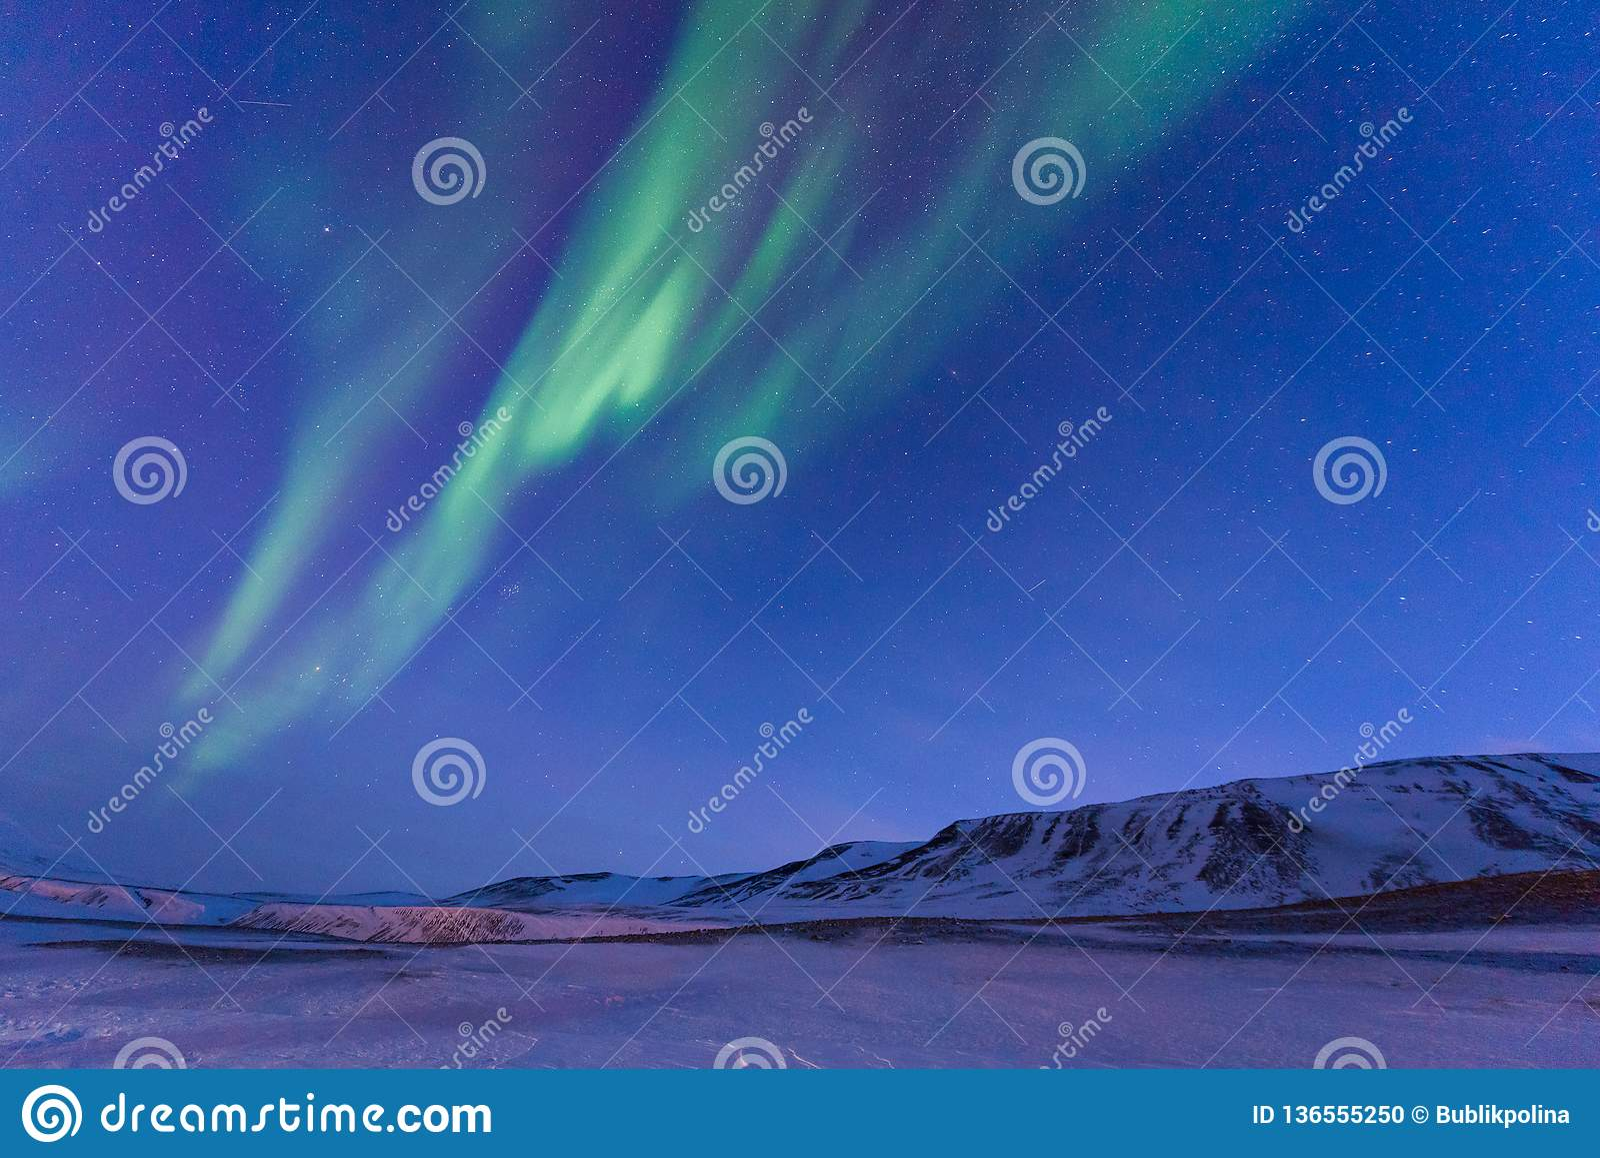 Polar arctic Northern lights aurora borealis sky star in Norway Svalbard in Longyearbyen the moon mountains